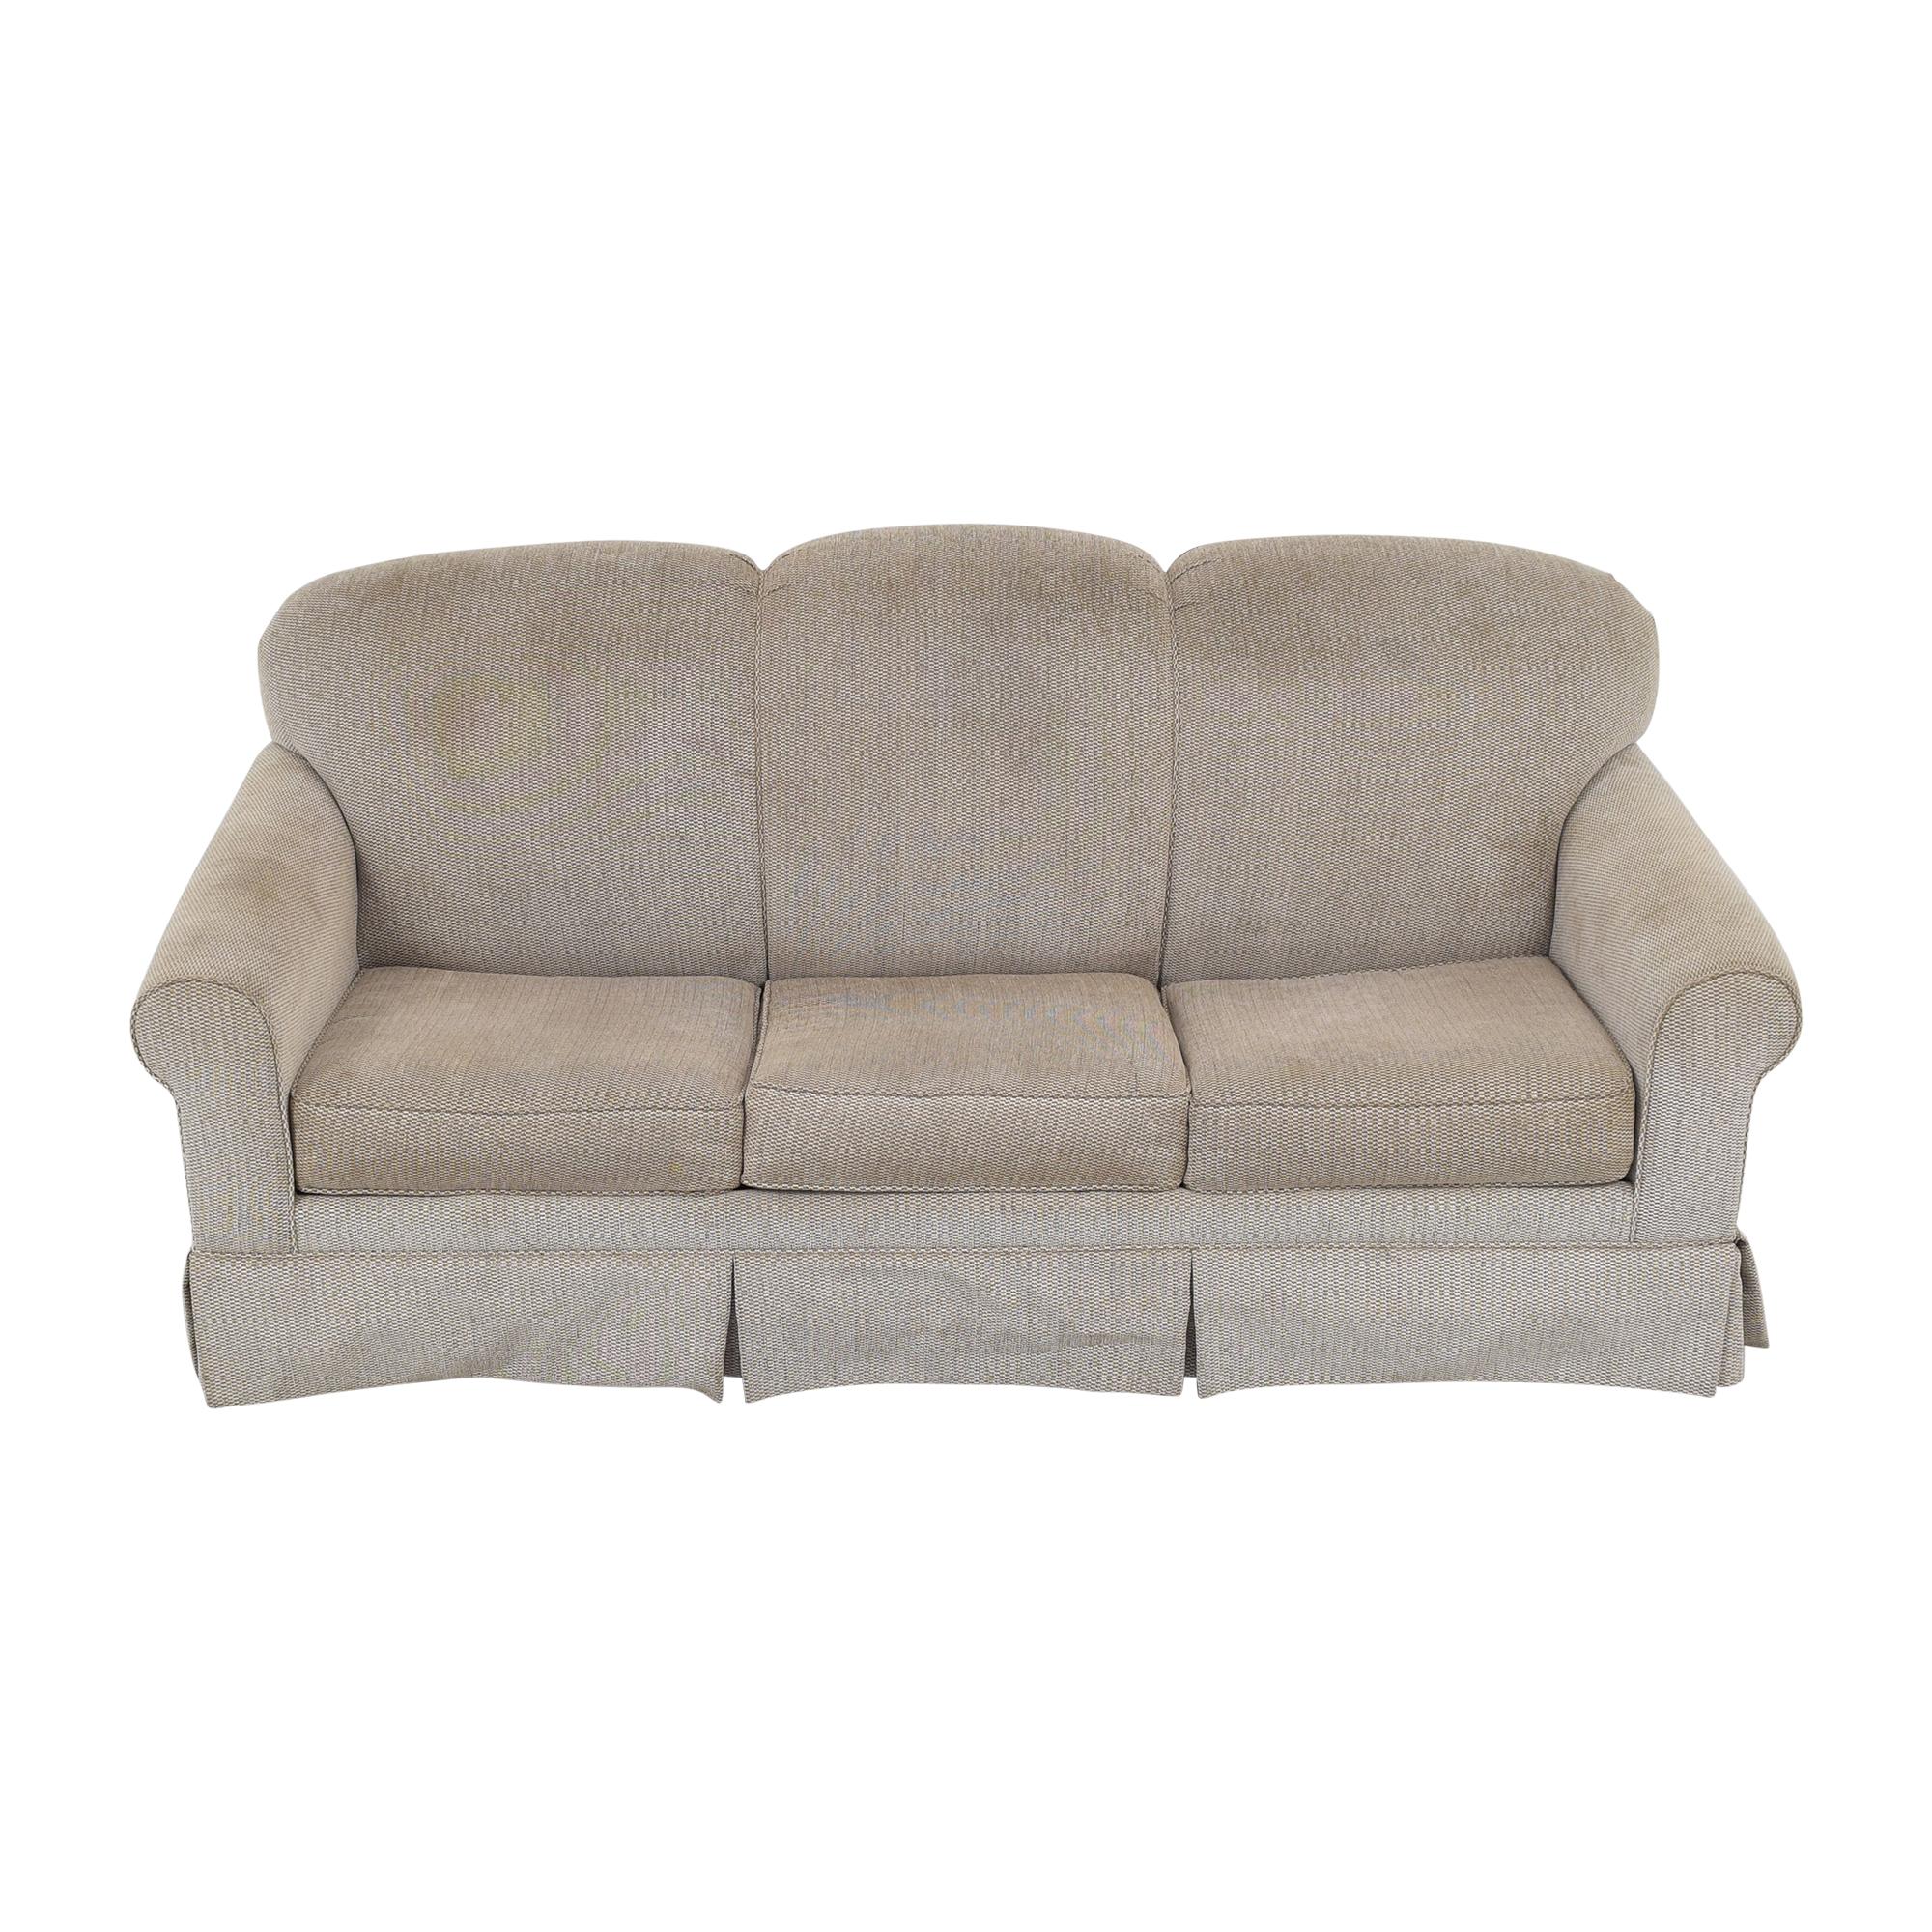 Craftmaster Full Size Sleeper Sofa Craftmaster Furniture